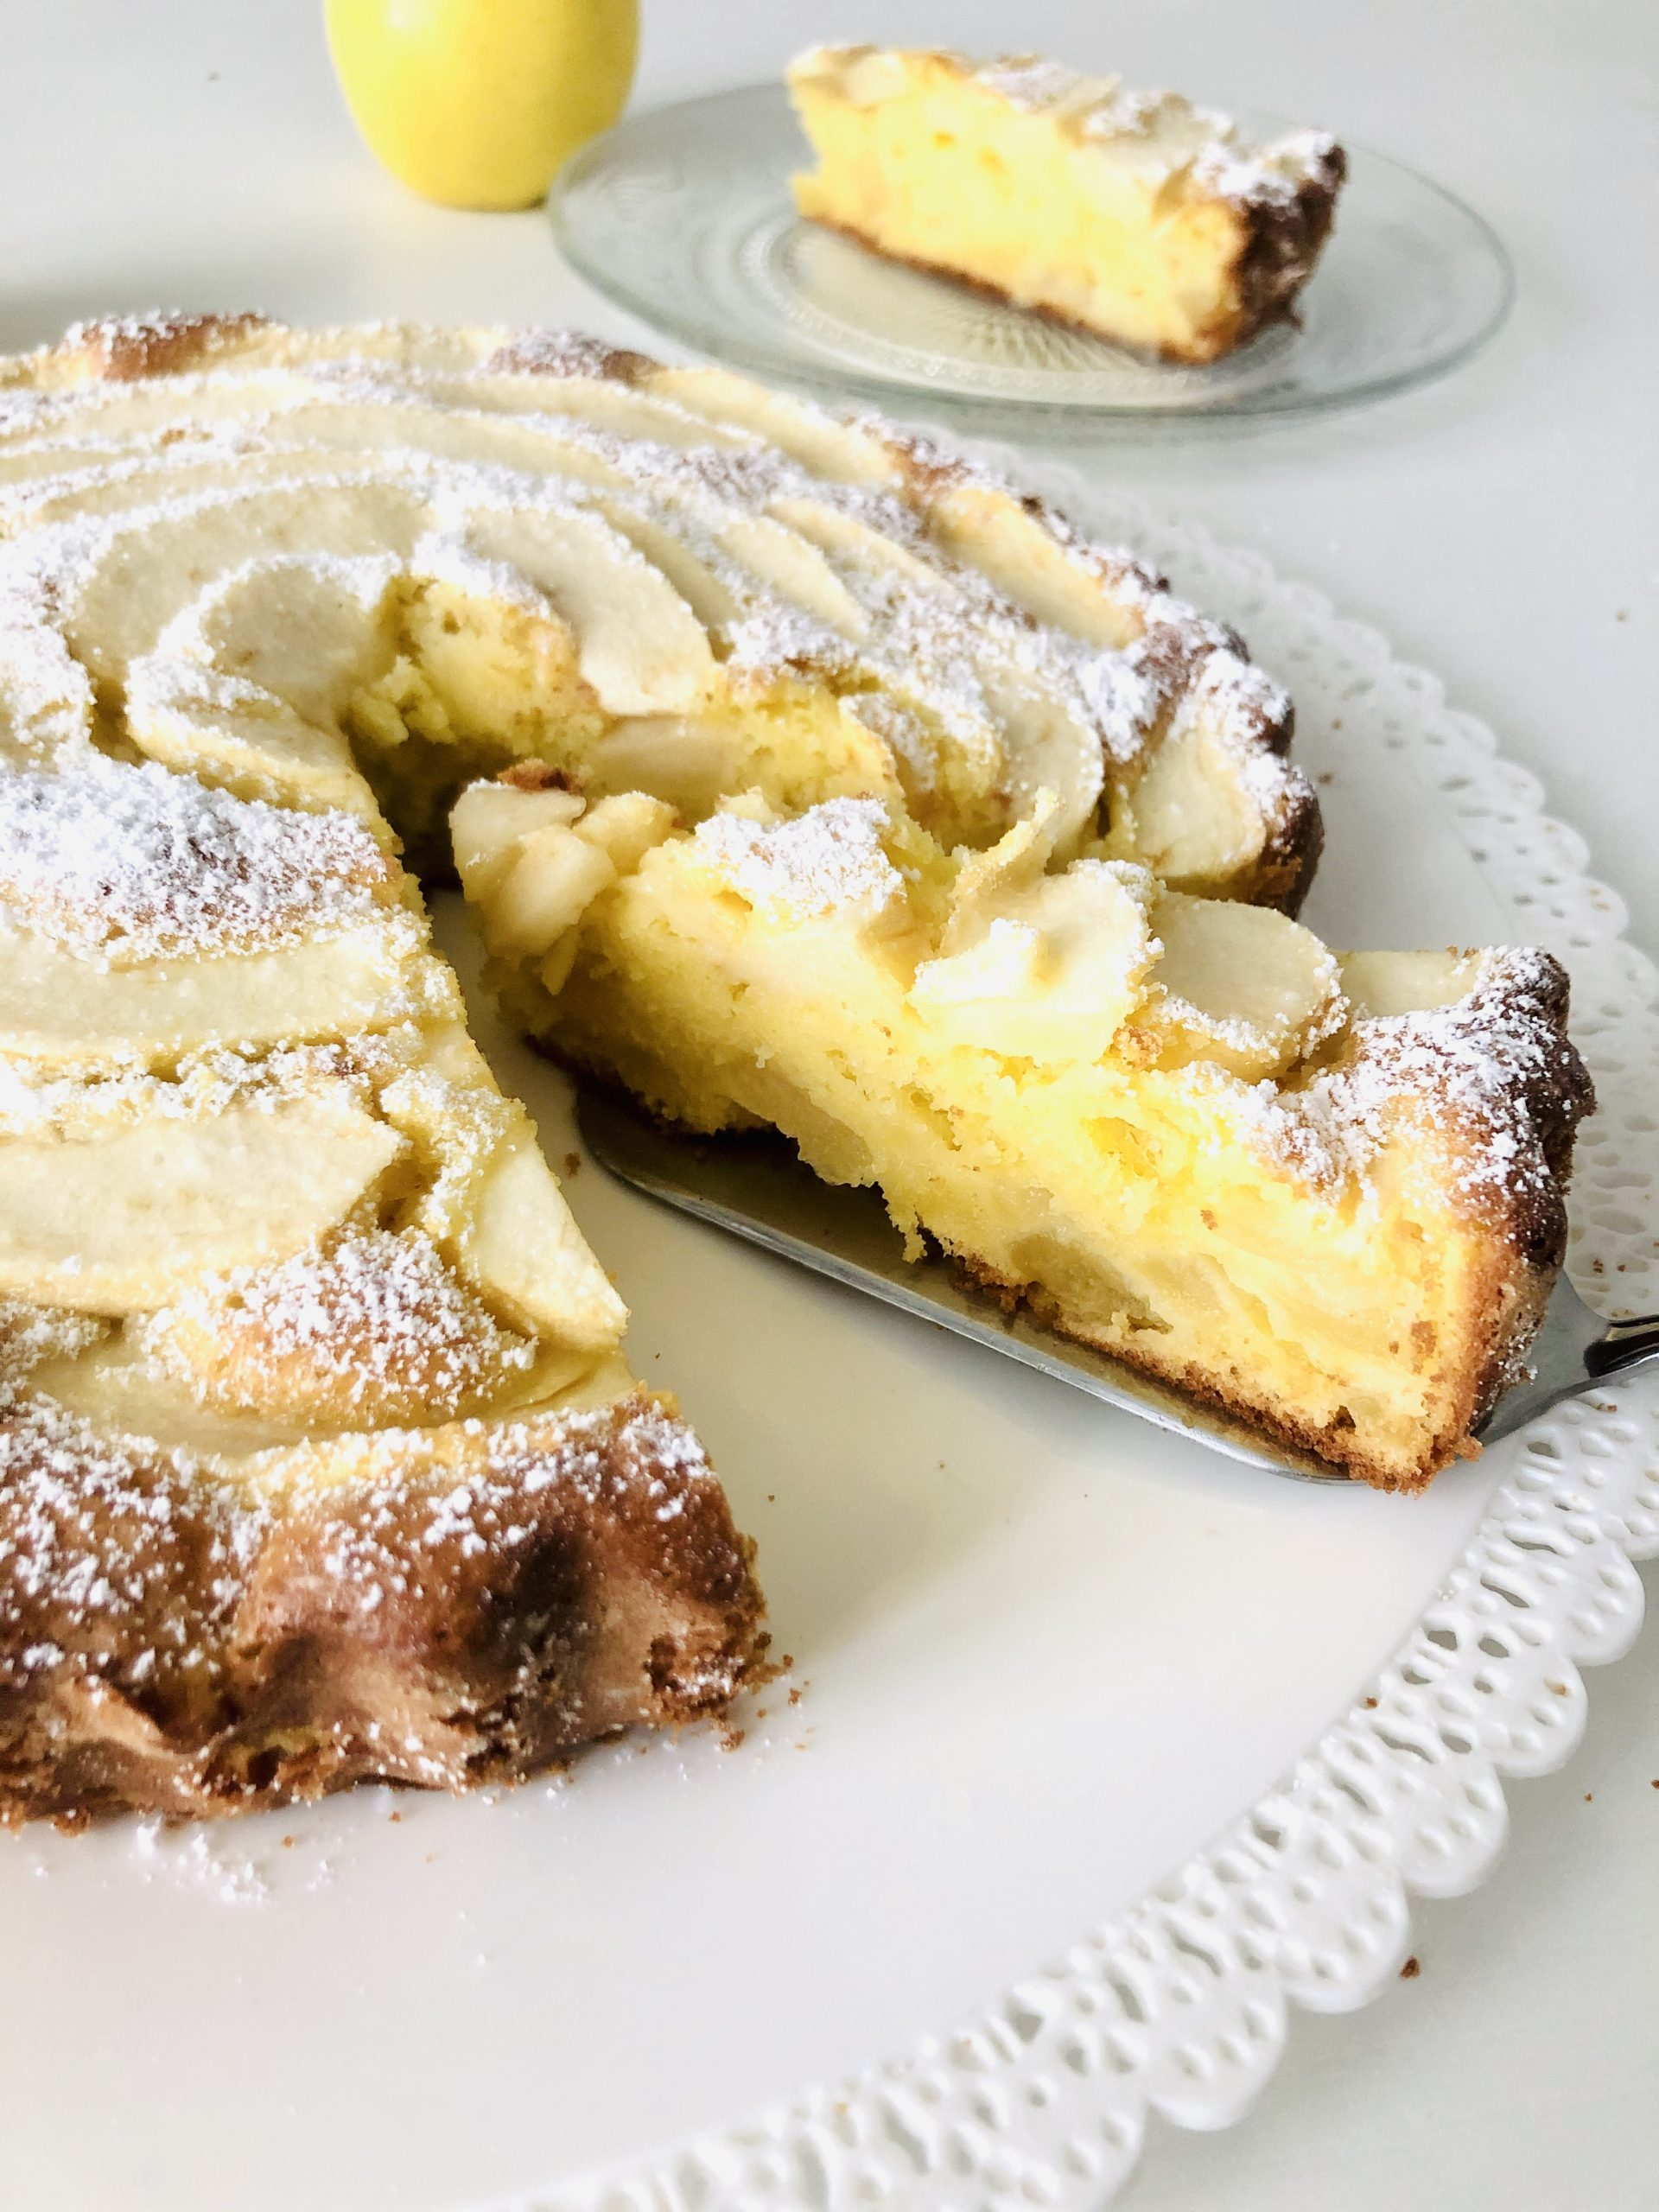 Torta morbida alle mele e yogurt al profumo di limone